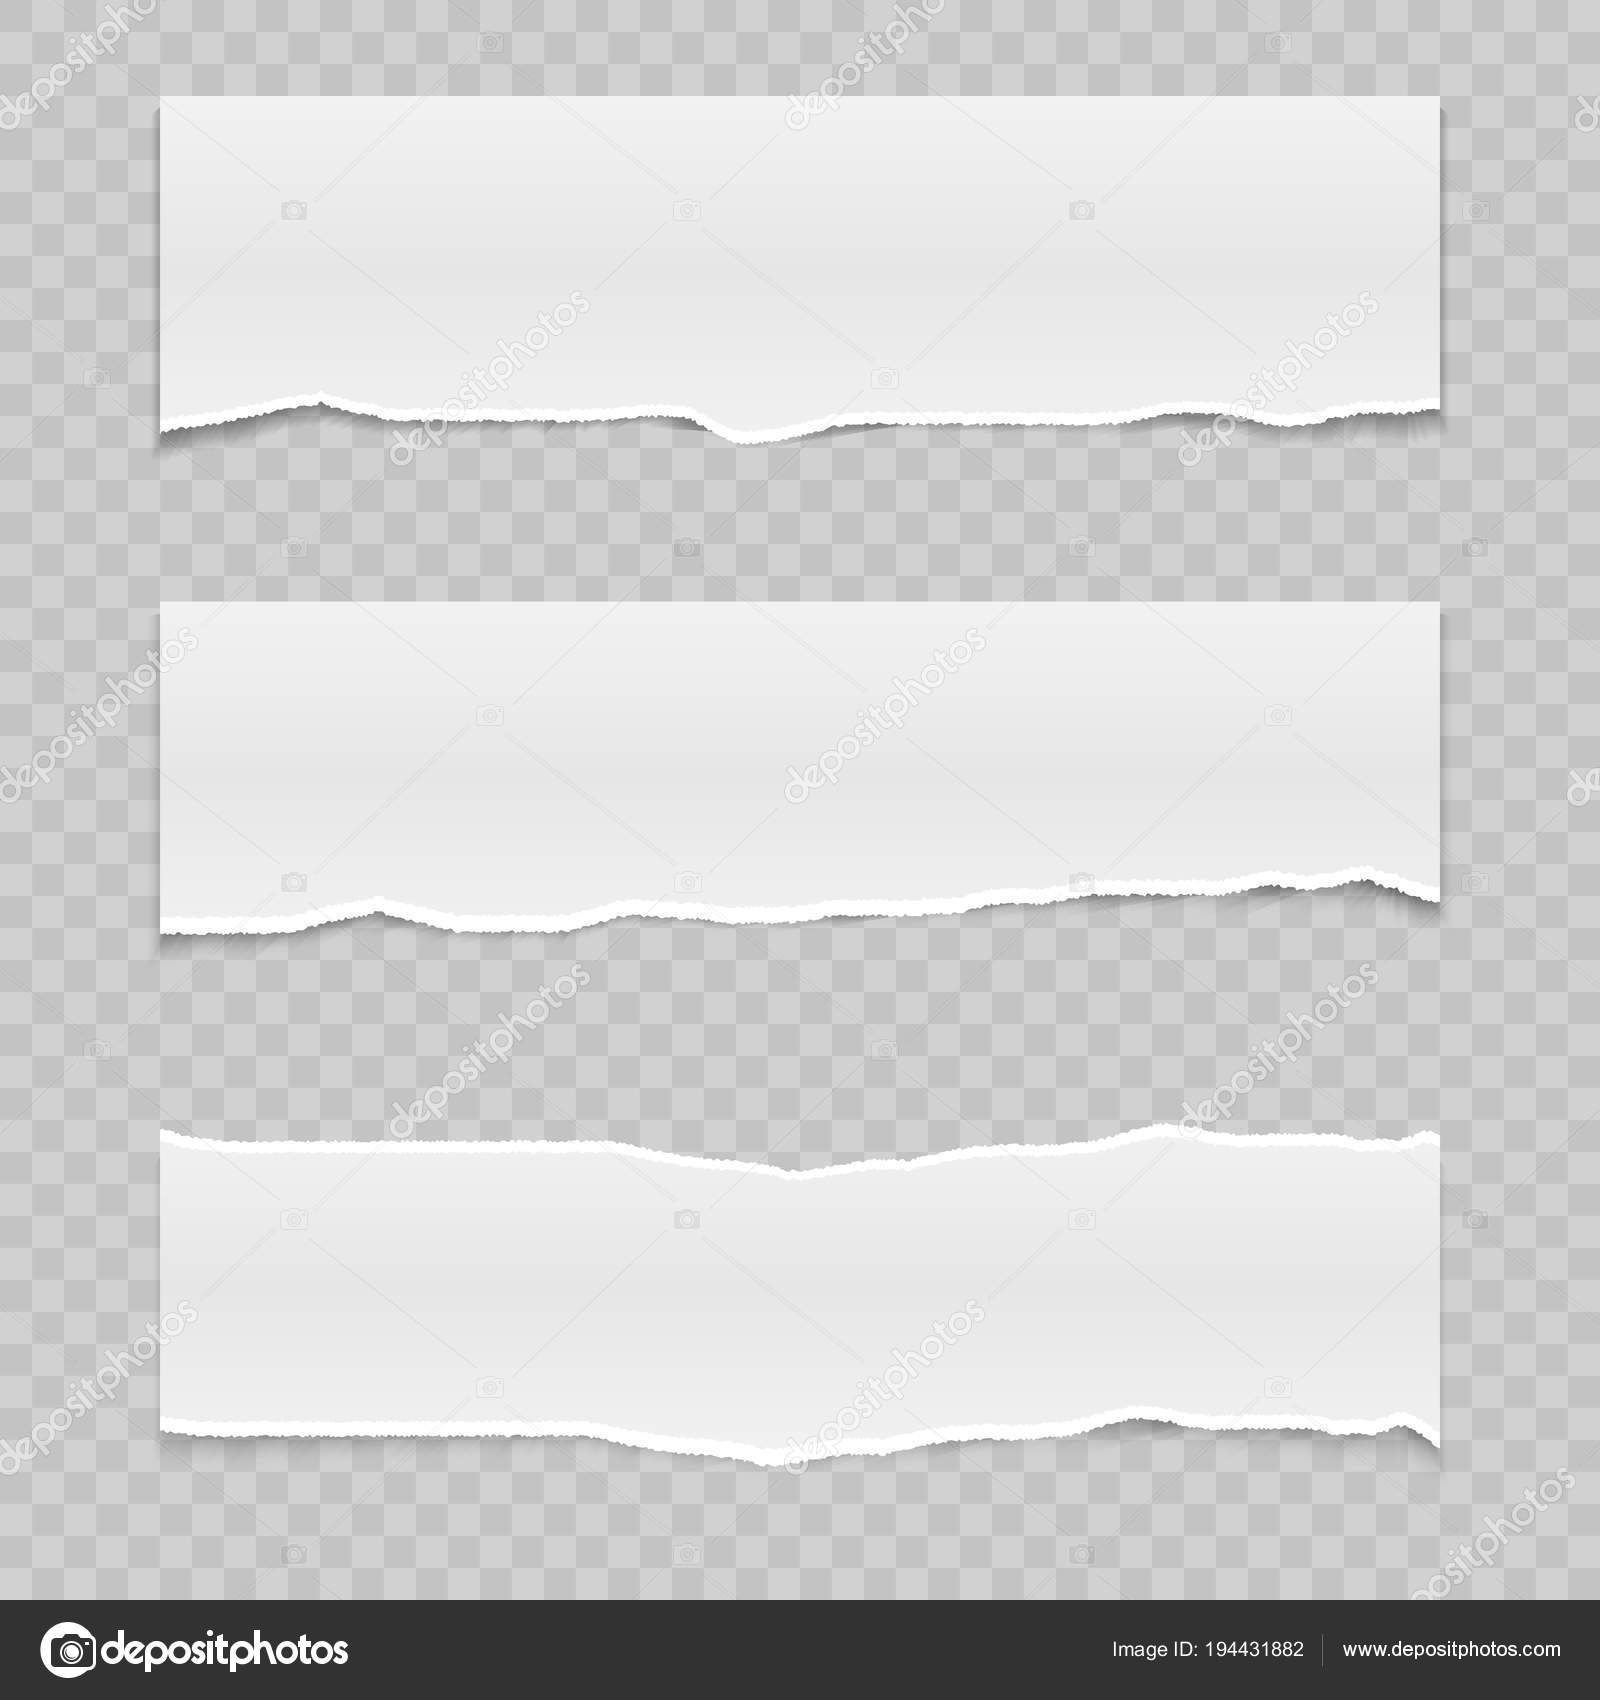 ripped paper — Stock Vector © grebeshkovmaxim@gmail com #194431882